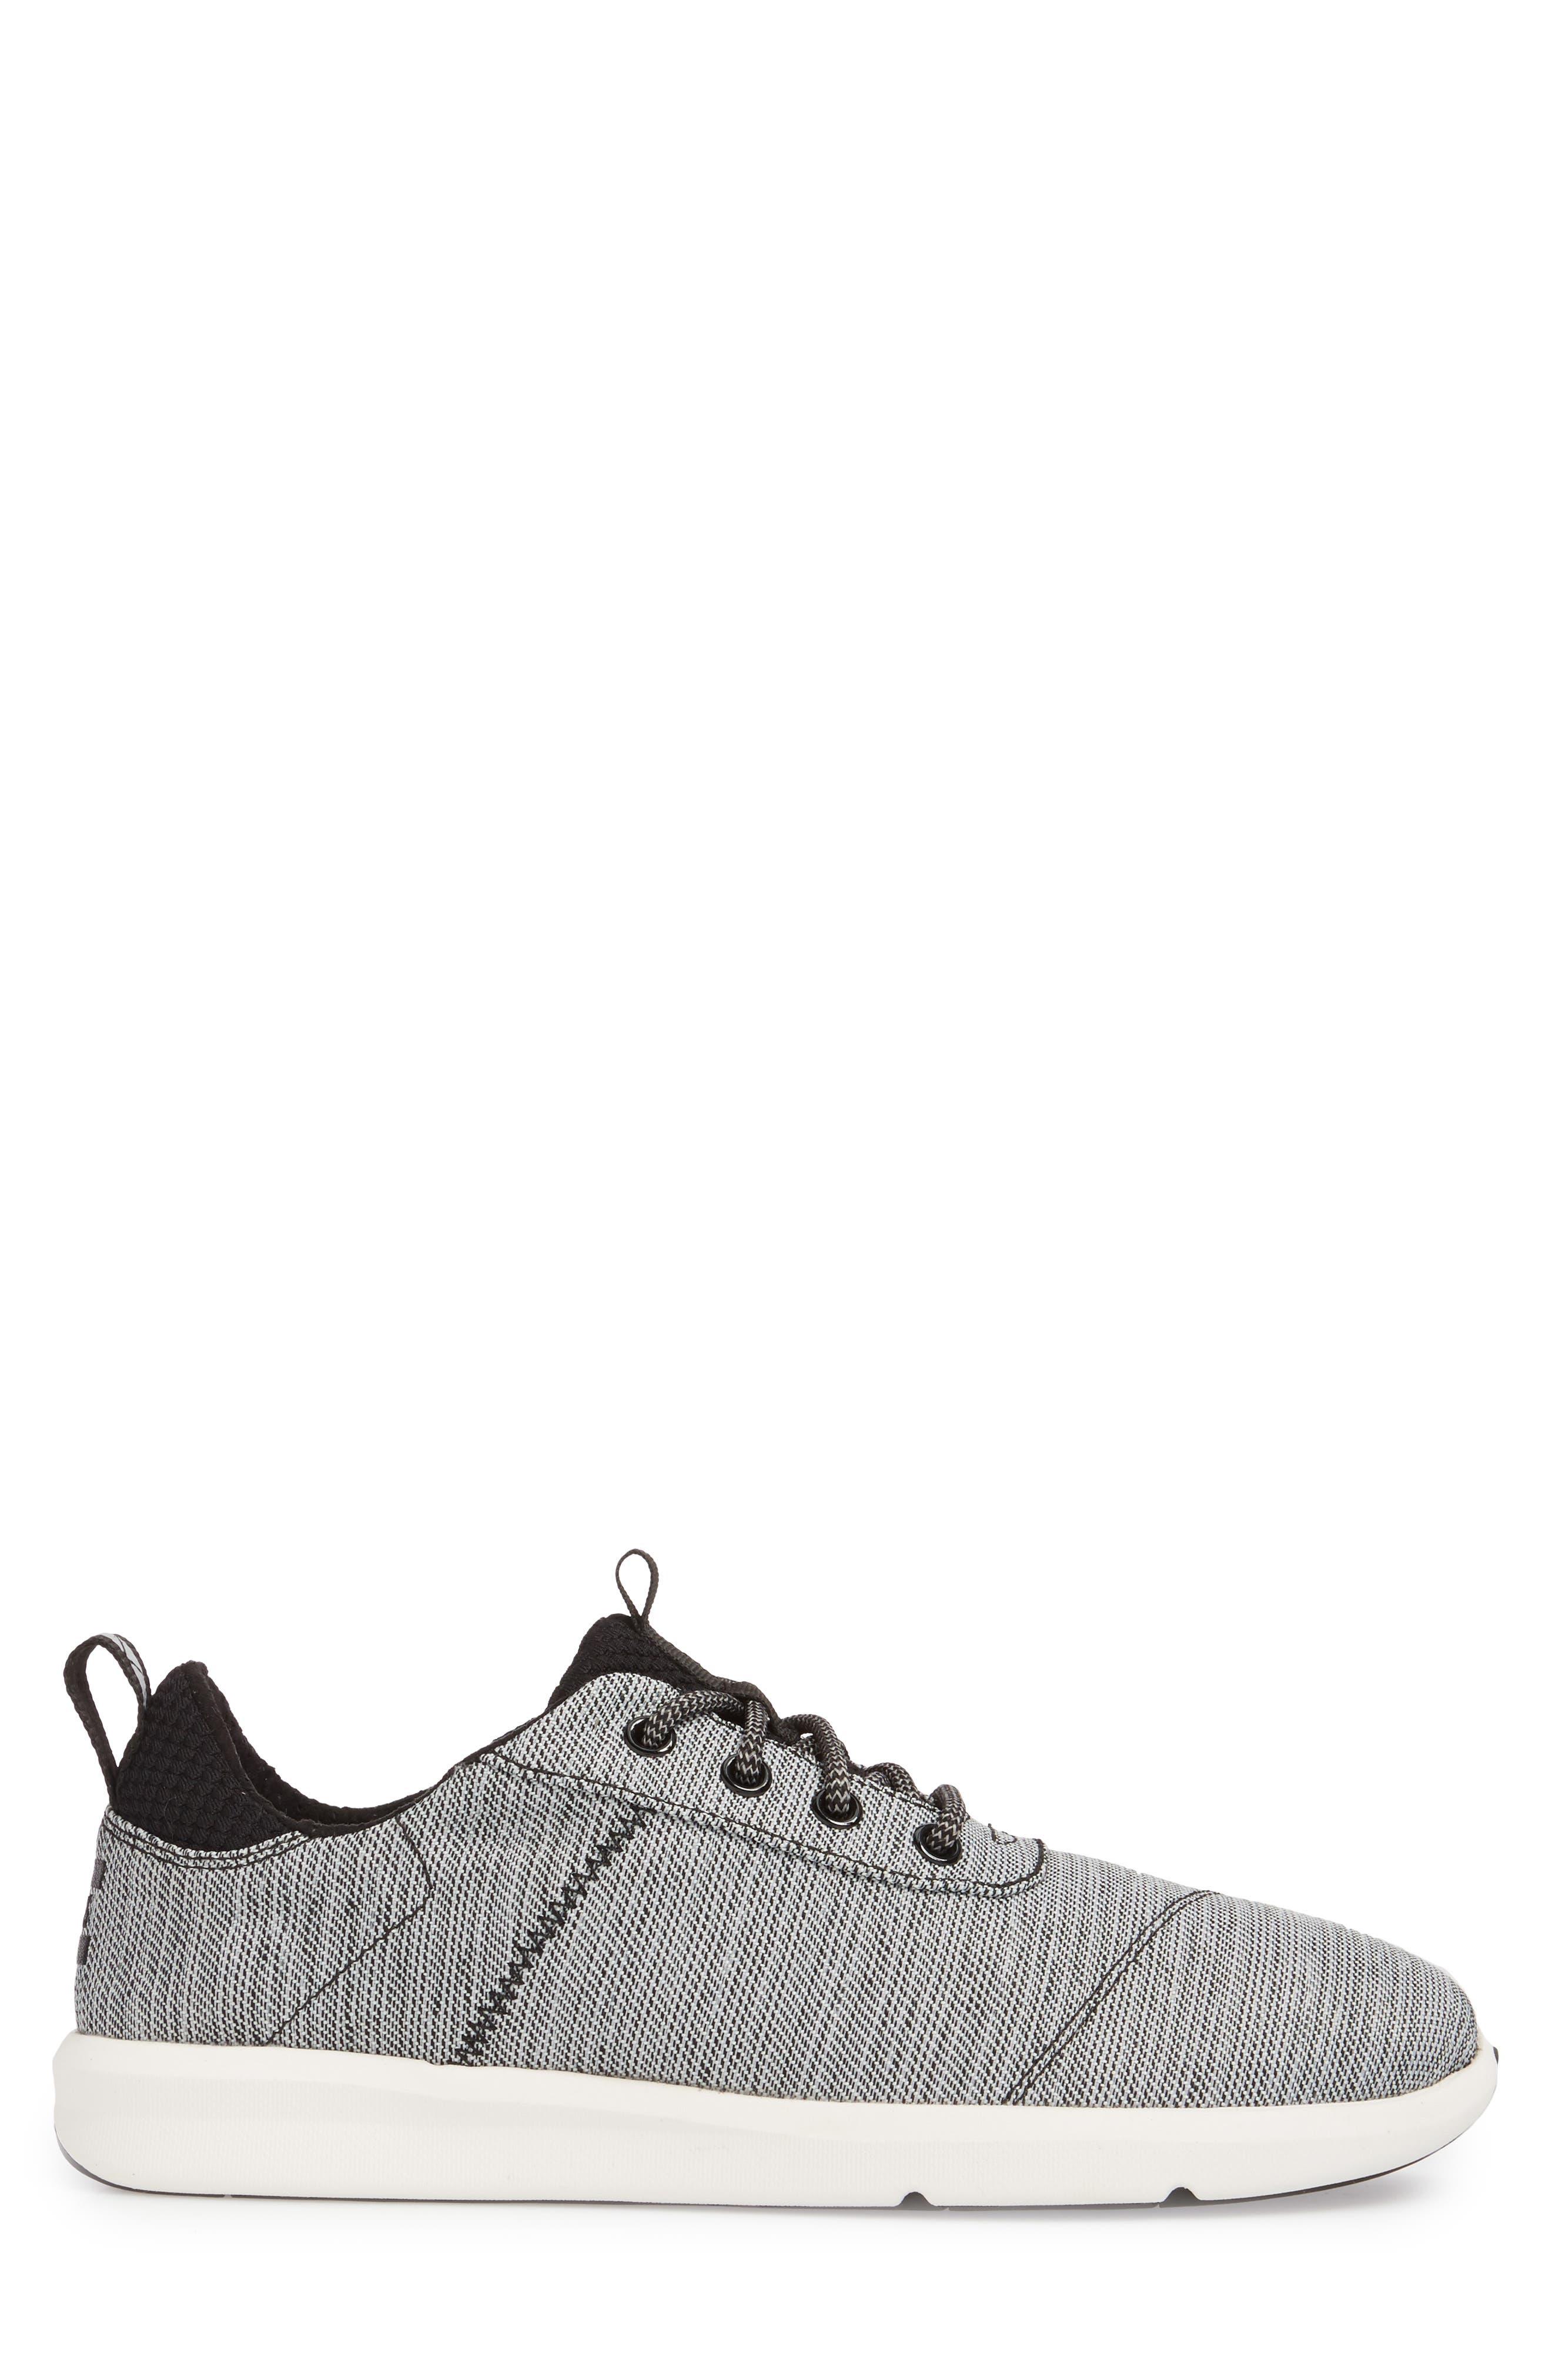 Cabrillo Sneaker,                             Alternate thumbnail 3, color,                             Black Space-Dye